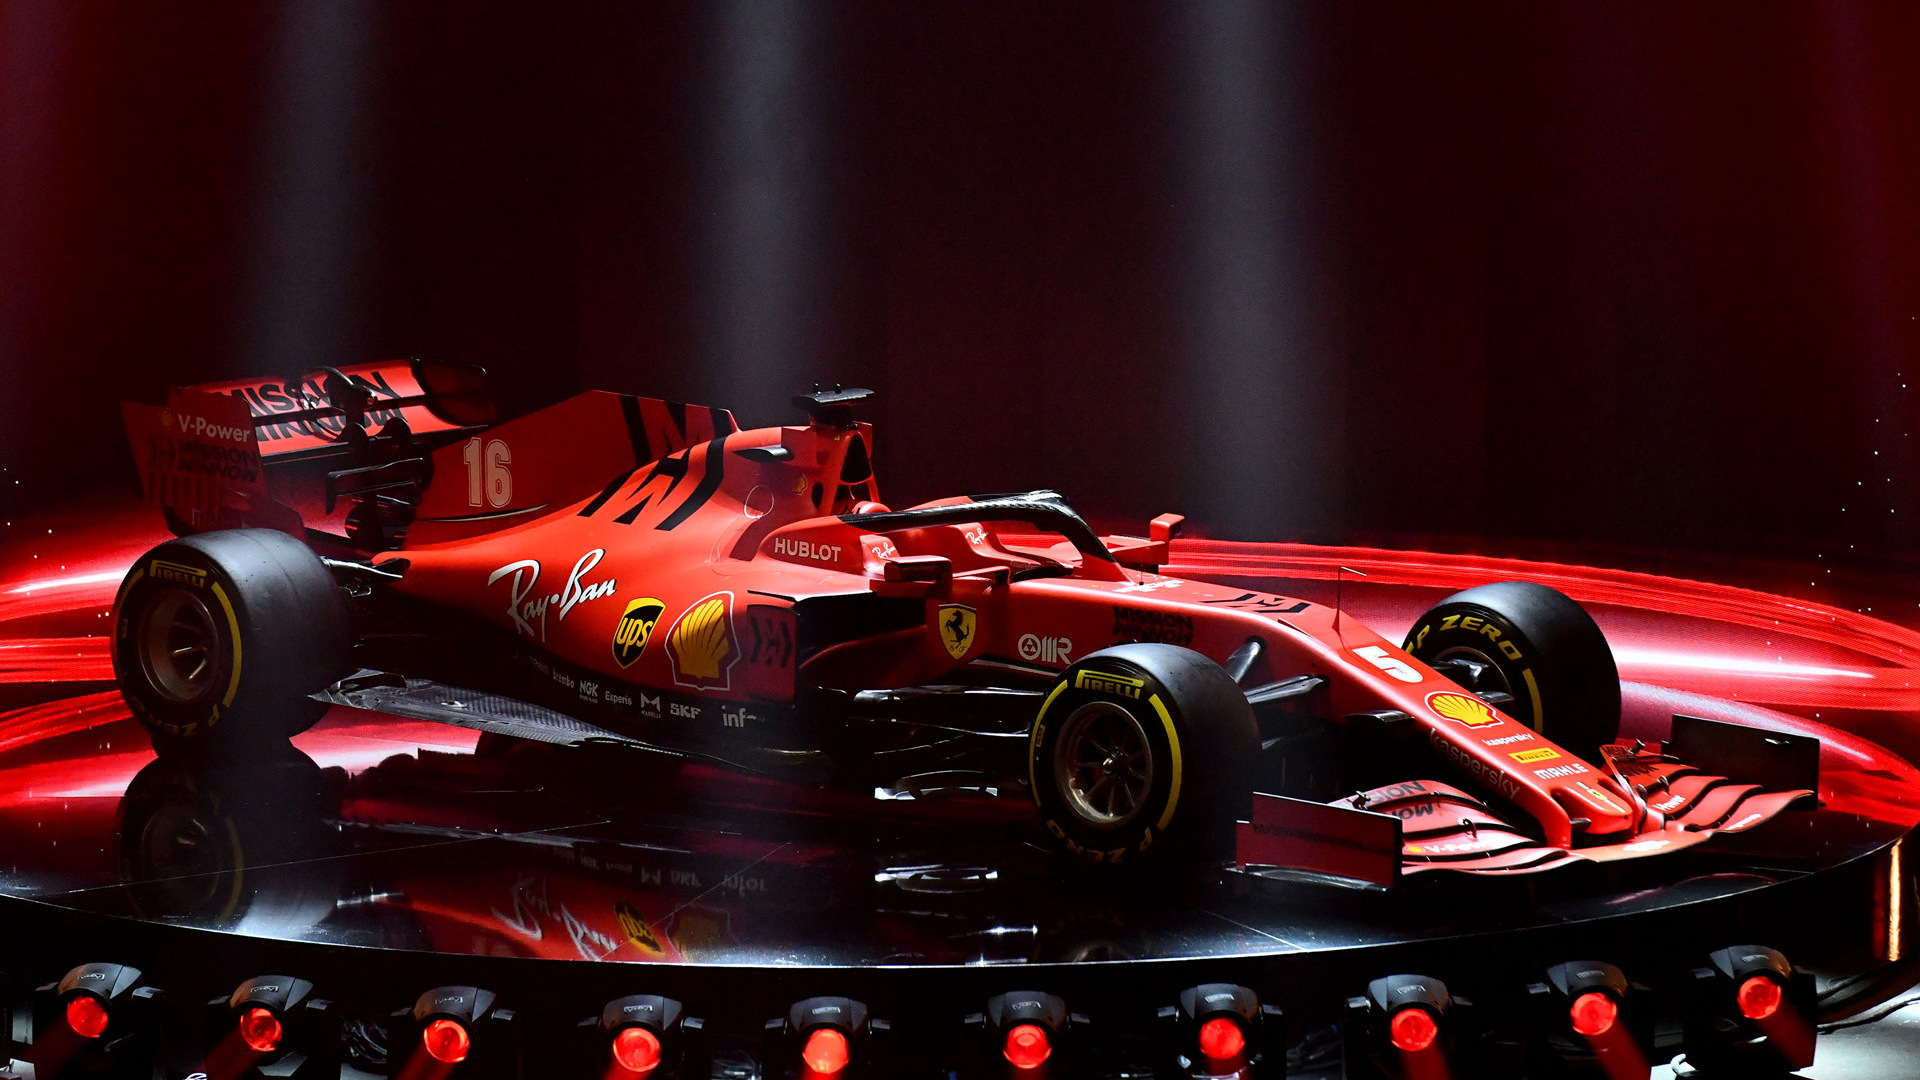 Ferrari S 2020 F1 Car Revealed As The Sf1000